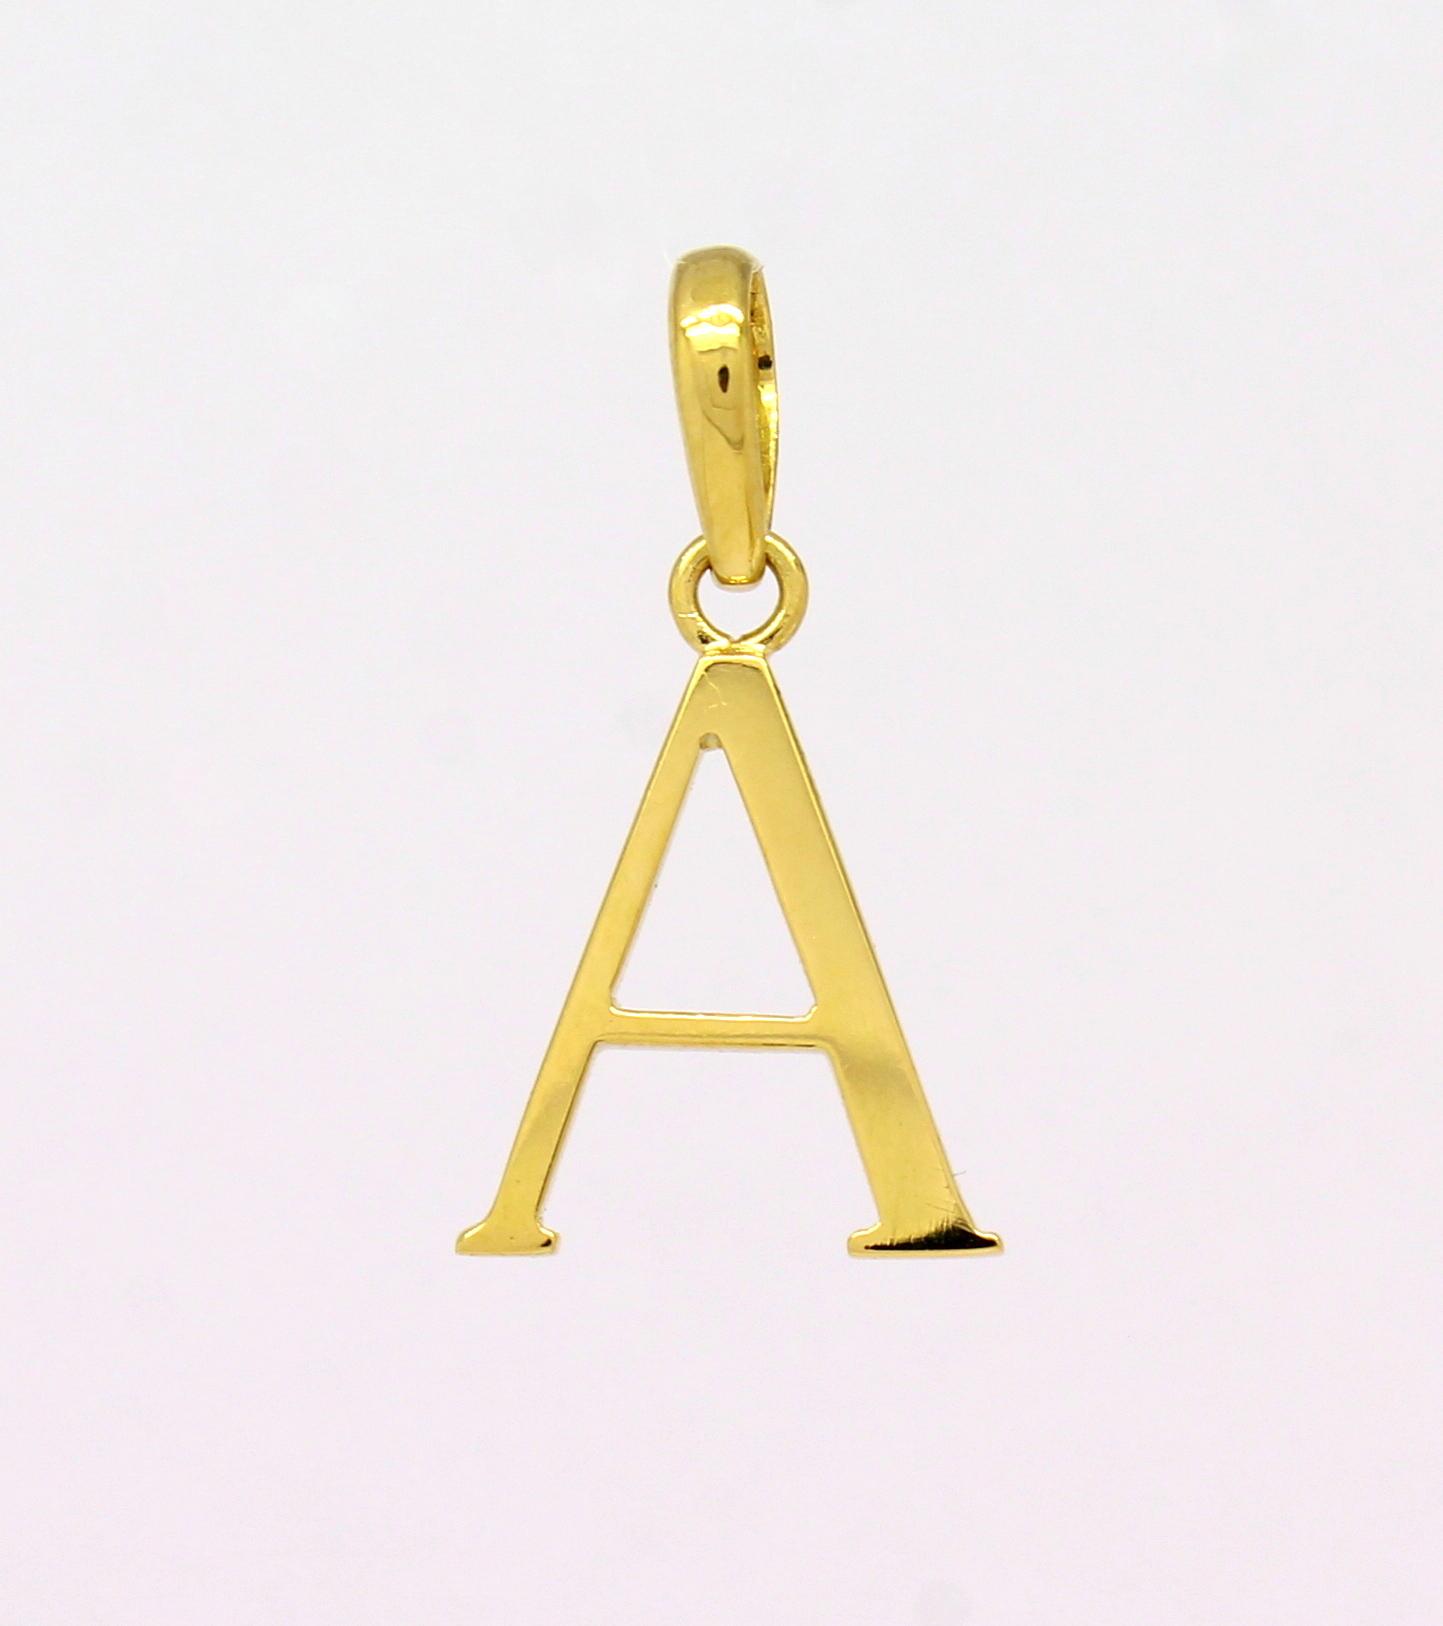 Pingente Letra Ouro Amarelo 18k 750 - Marcio Joalheiros   Marcio ... 9d29d4faee